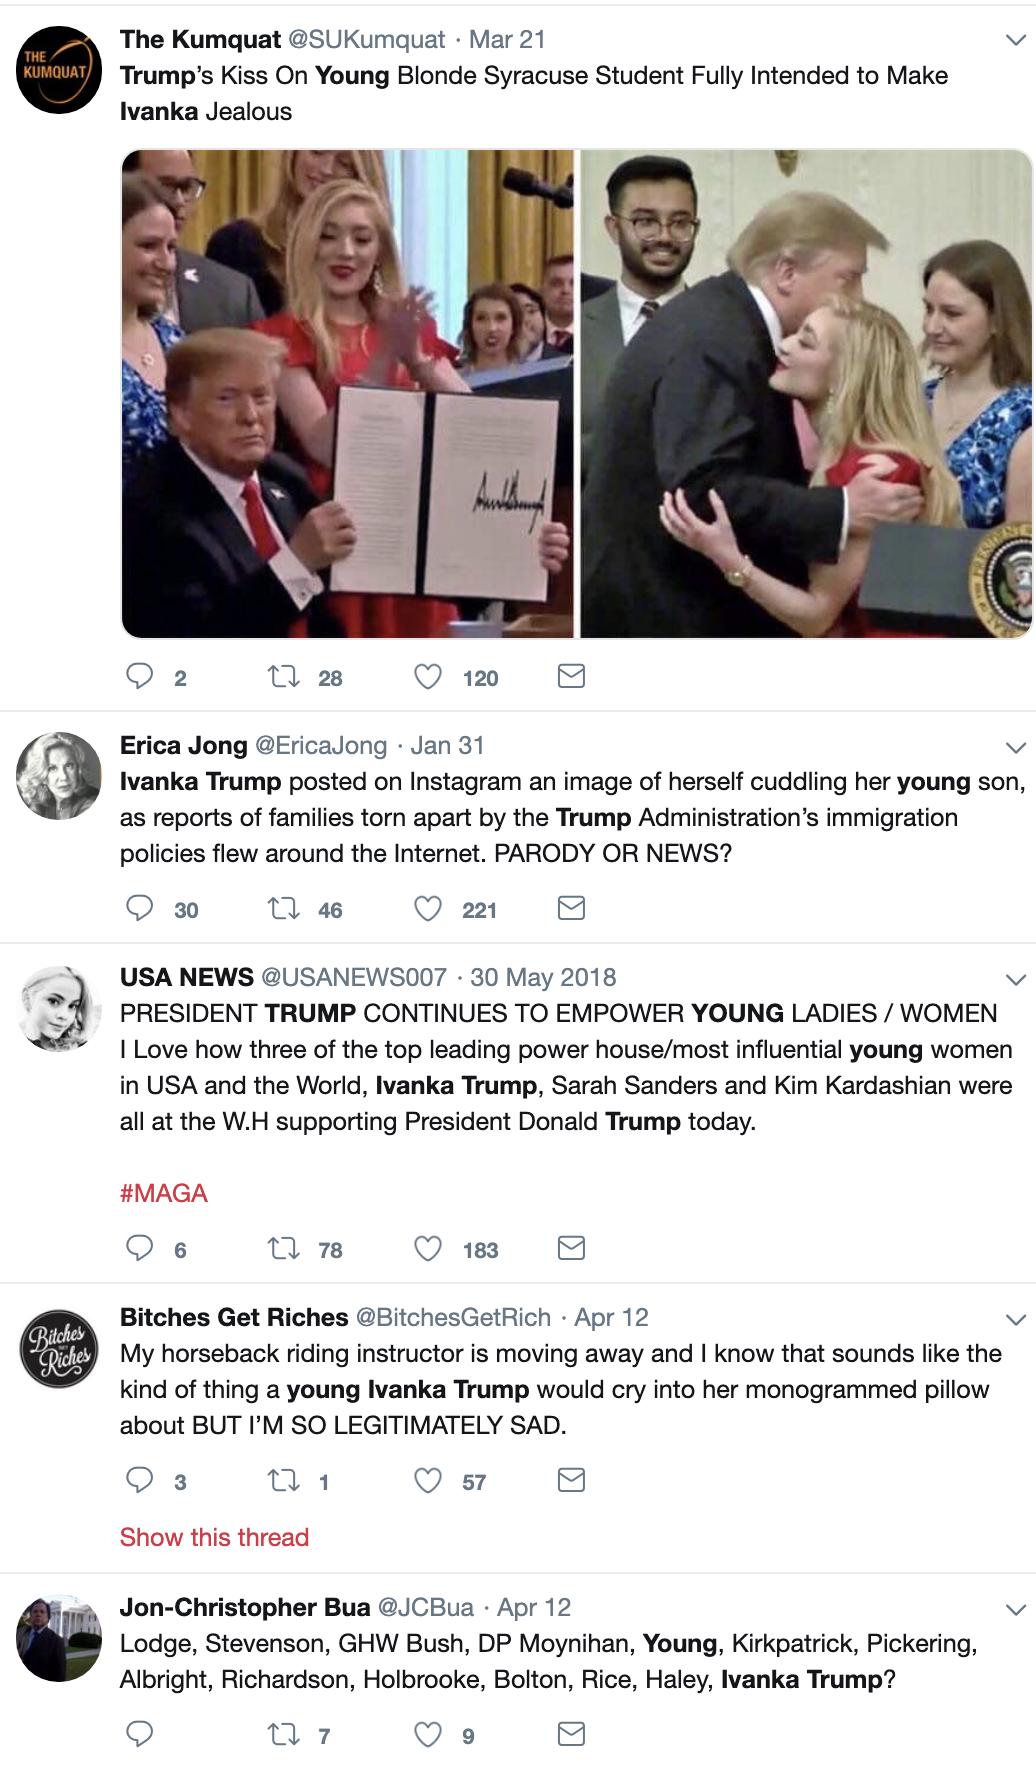 Screen-Shot-2019-05-08-at-4.01.46-PM Trump Hotel Liquor LicenseRevocation Move Humiliates Donald Again Corruption Crime Donald Trump Economy Politics Top Stories